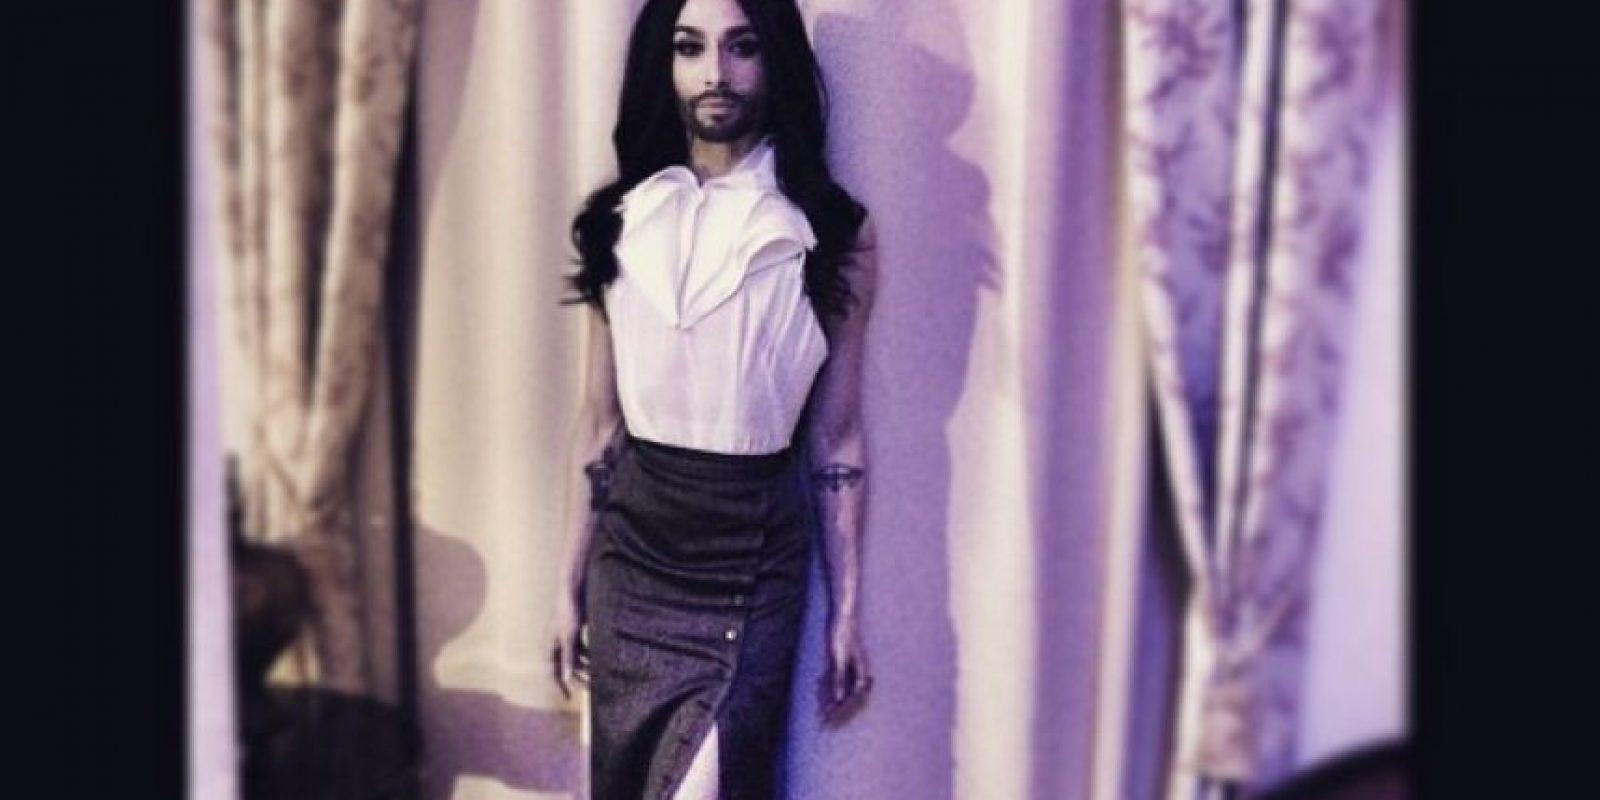 7. En 2014 ganó Conchita Wurst. Foto:Vía Instagram.com/conchitawurst